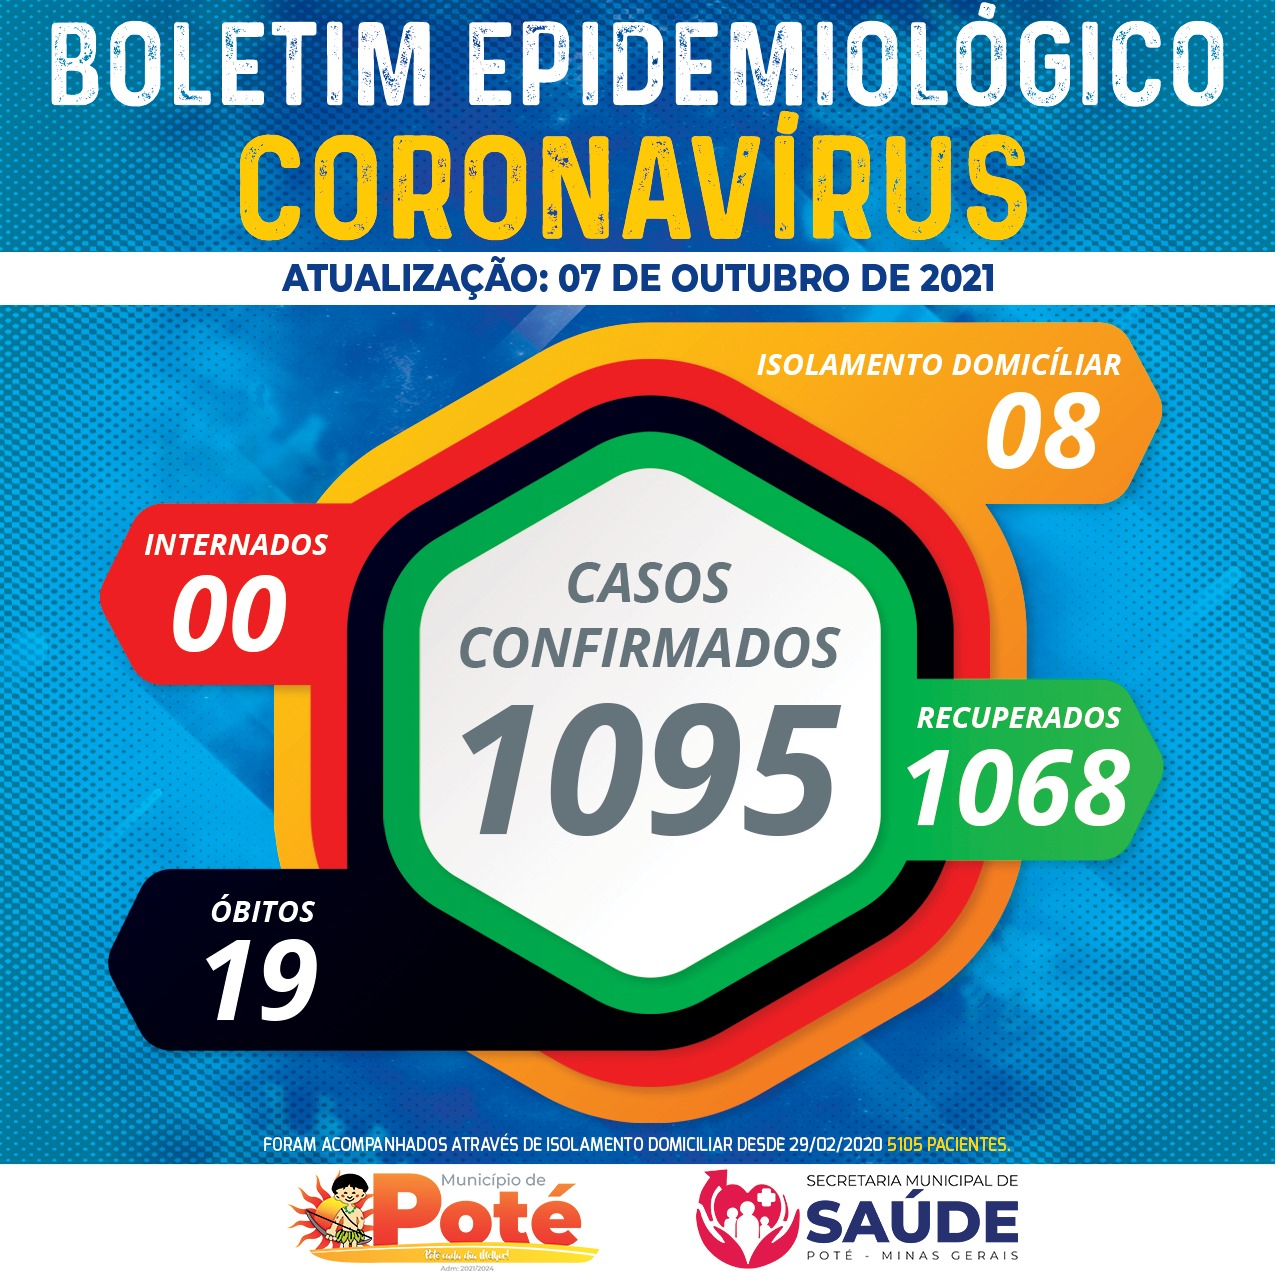 BOLETIM EPIDEMIOLÓGICO COVID-19 - 07/10/2021